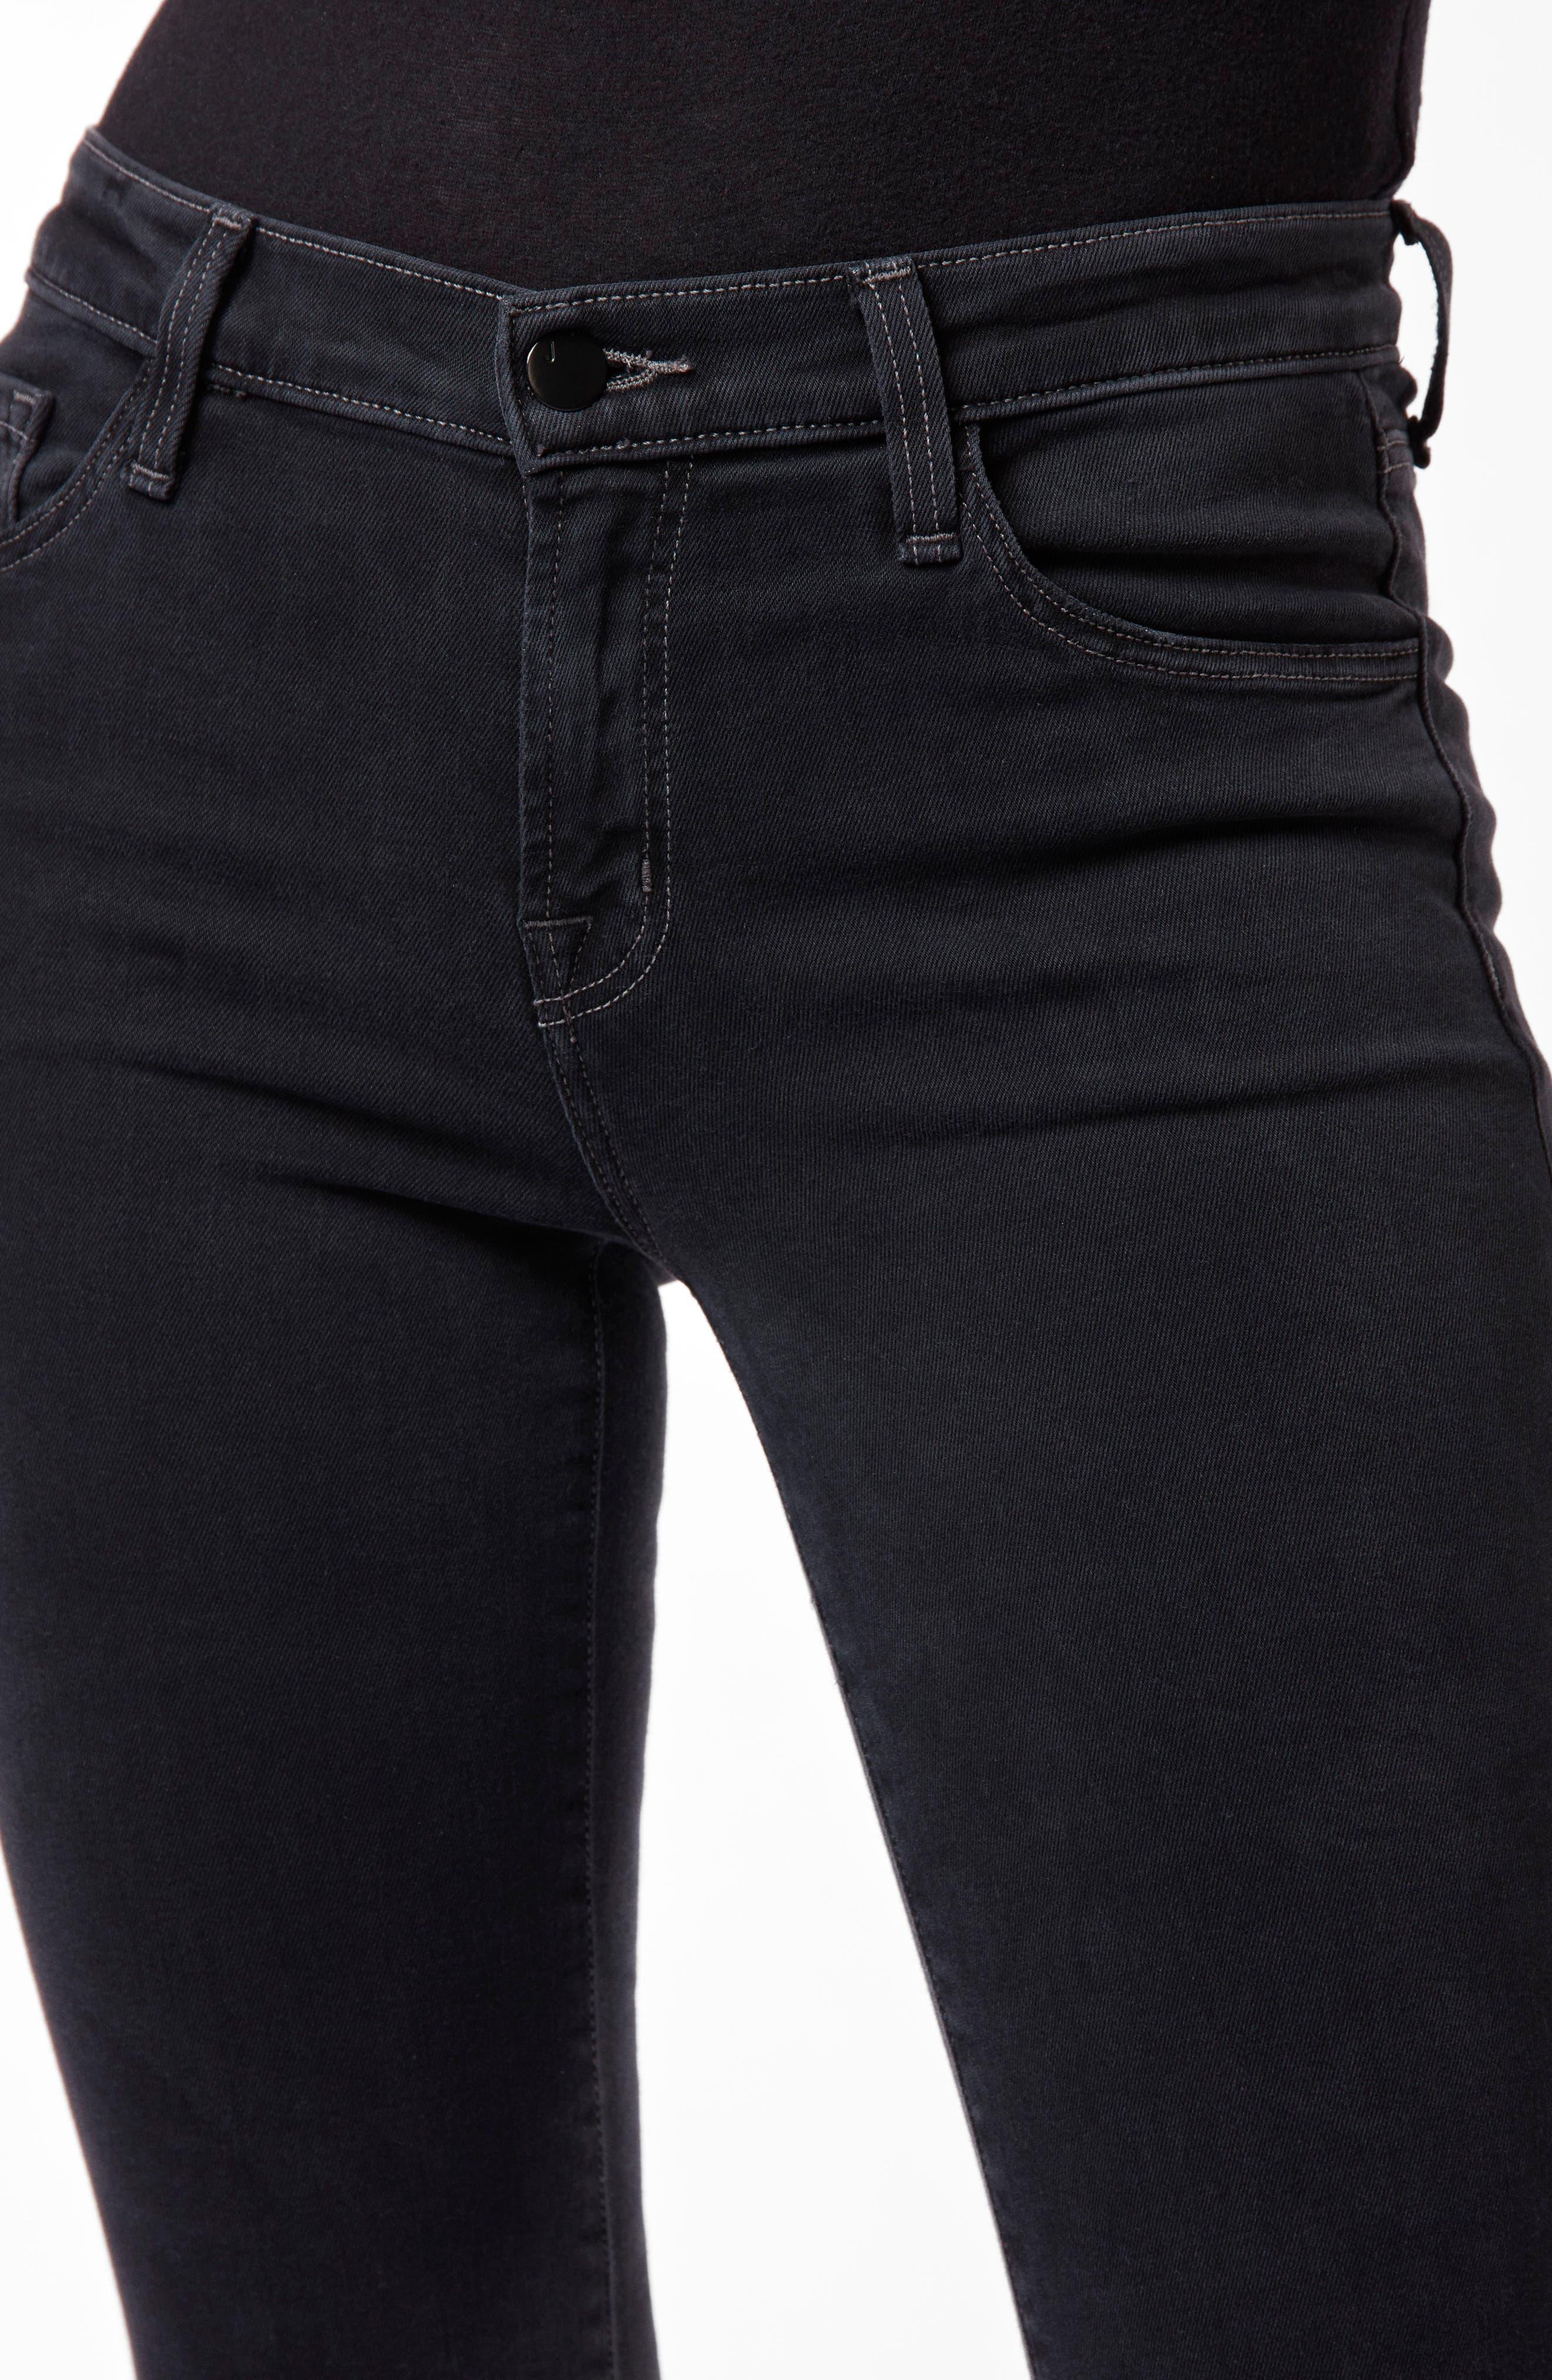 J BRAND,                             Selena Crop Bootcut Jeans,                             Alternate thumbnail 5, color,                             001